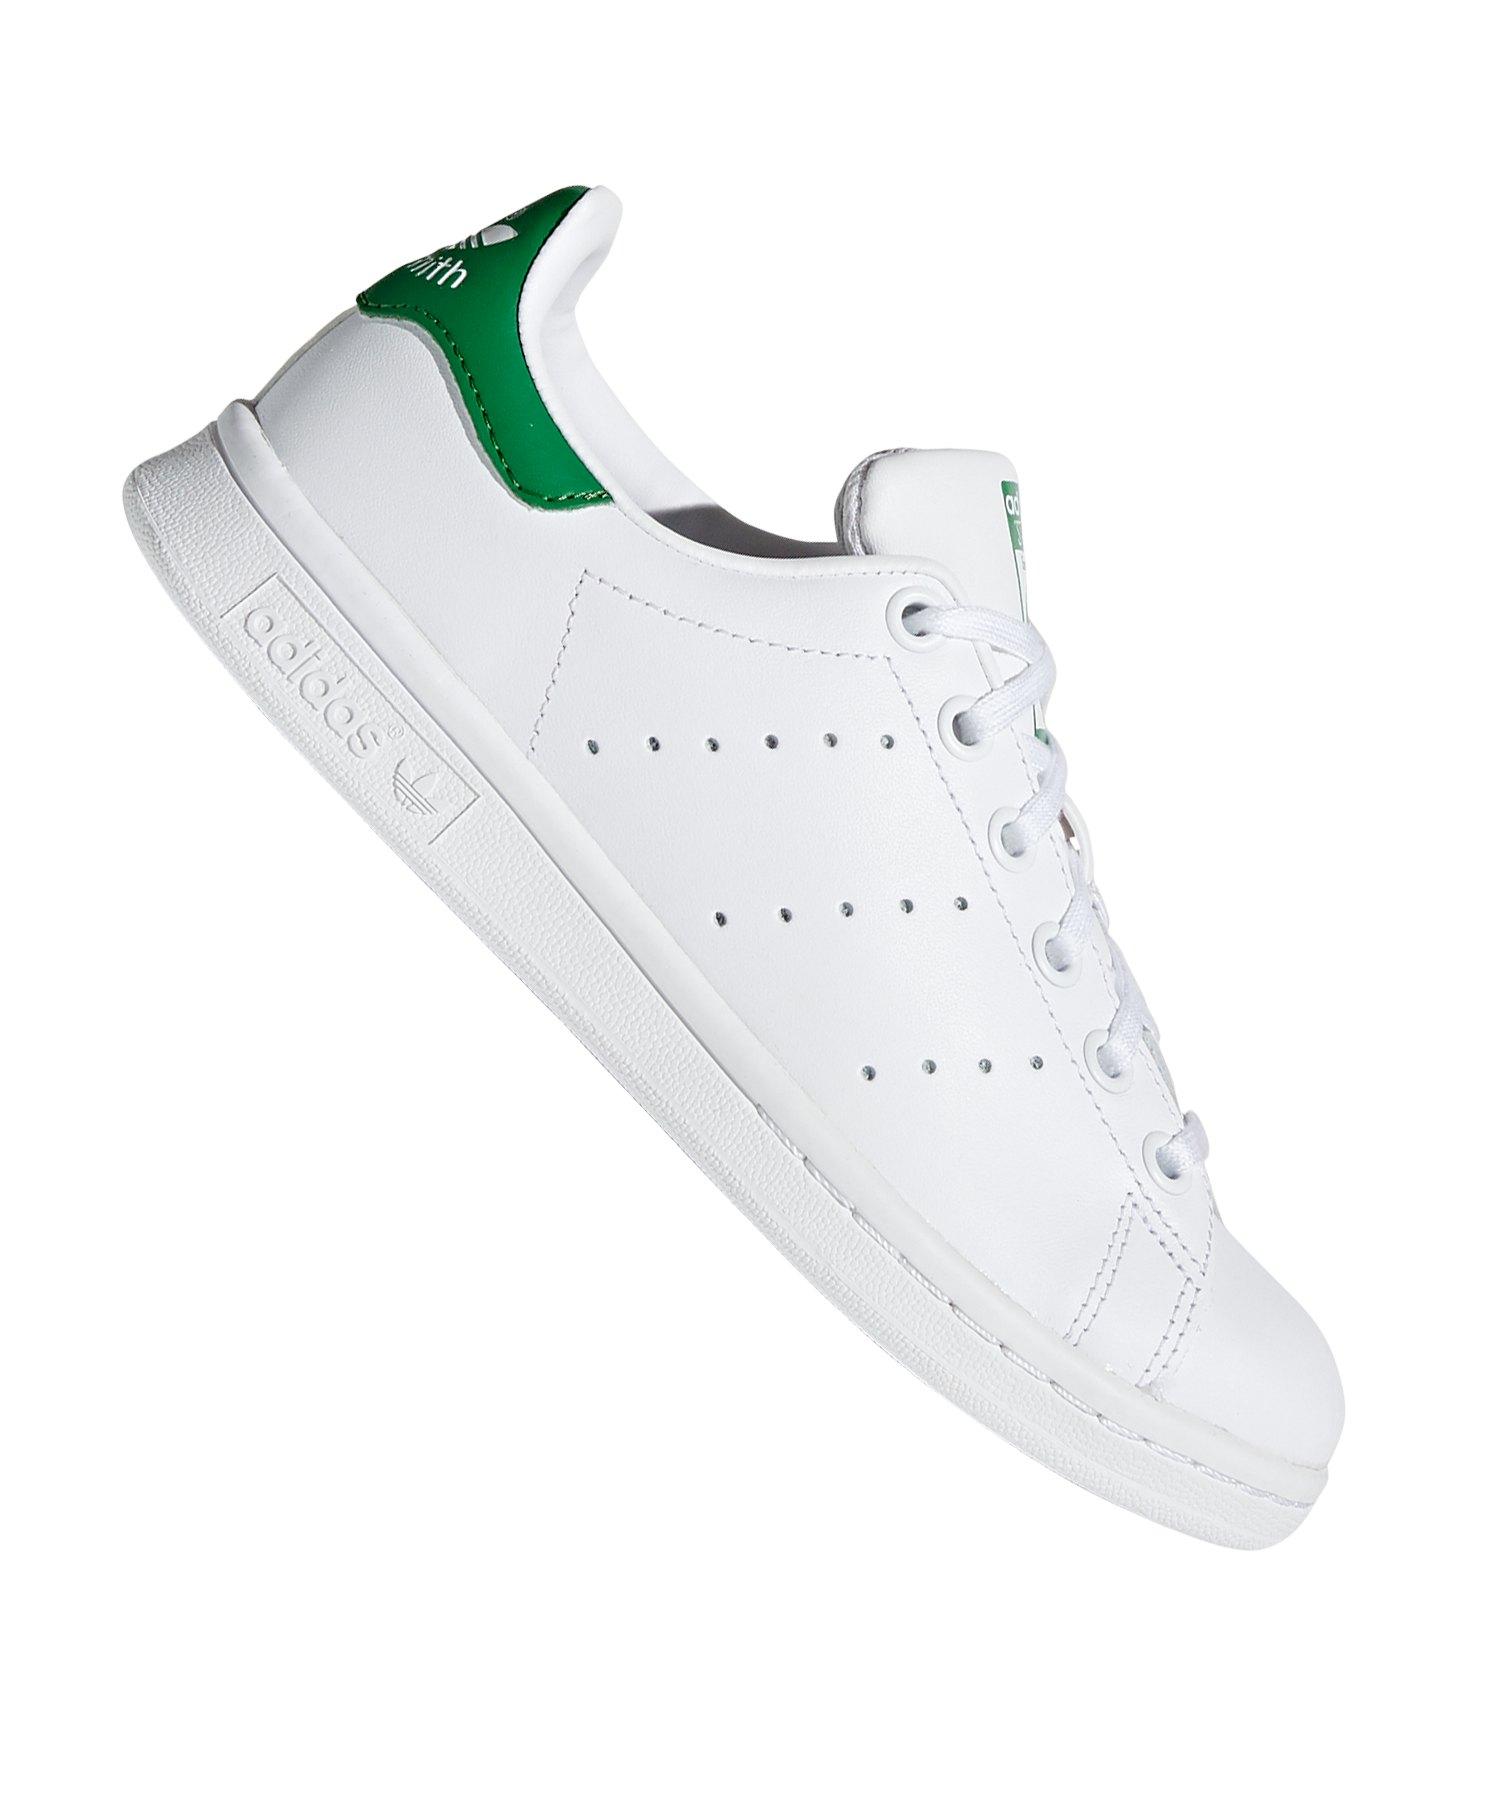 115db1e239c845 Smith Kids lifestyle J Originals Stan Sneaker Weiss Adidas gpZBx